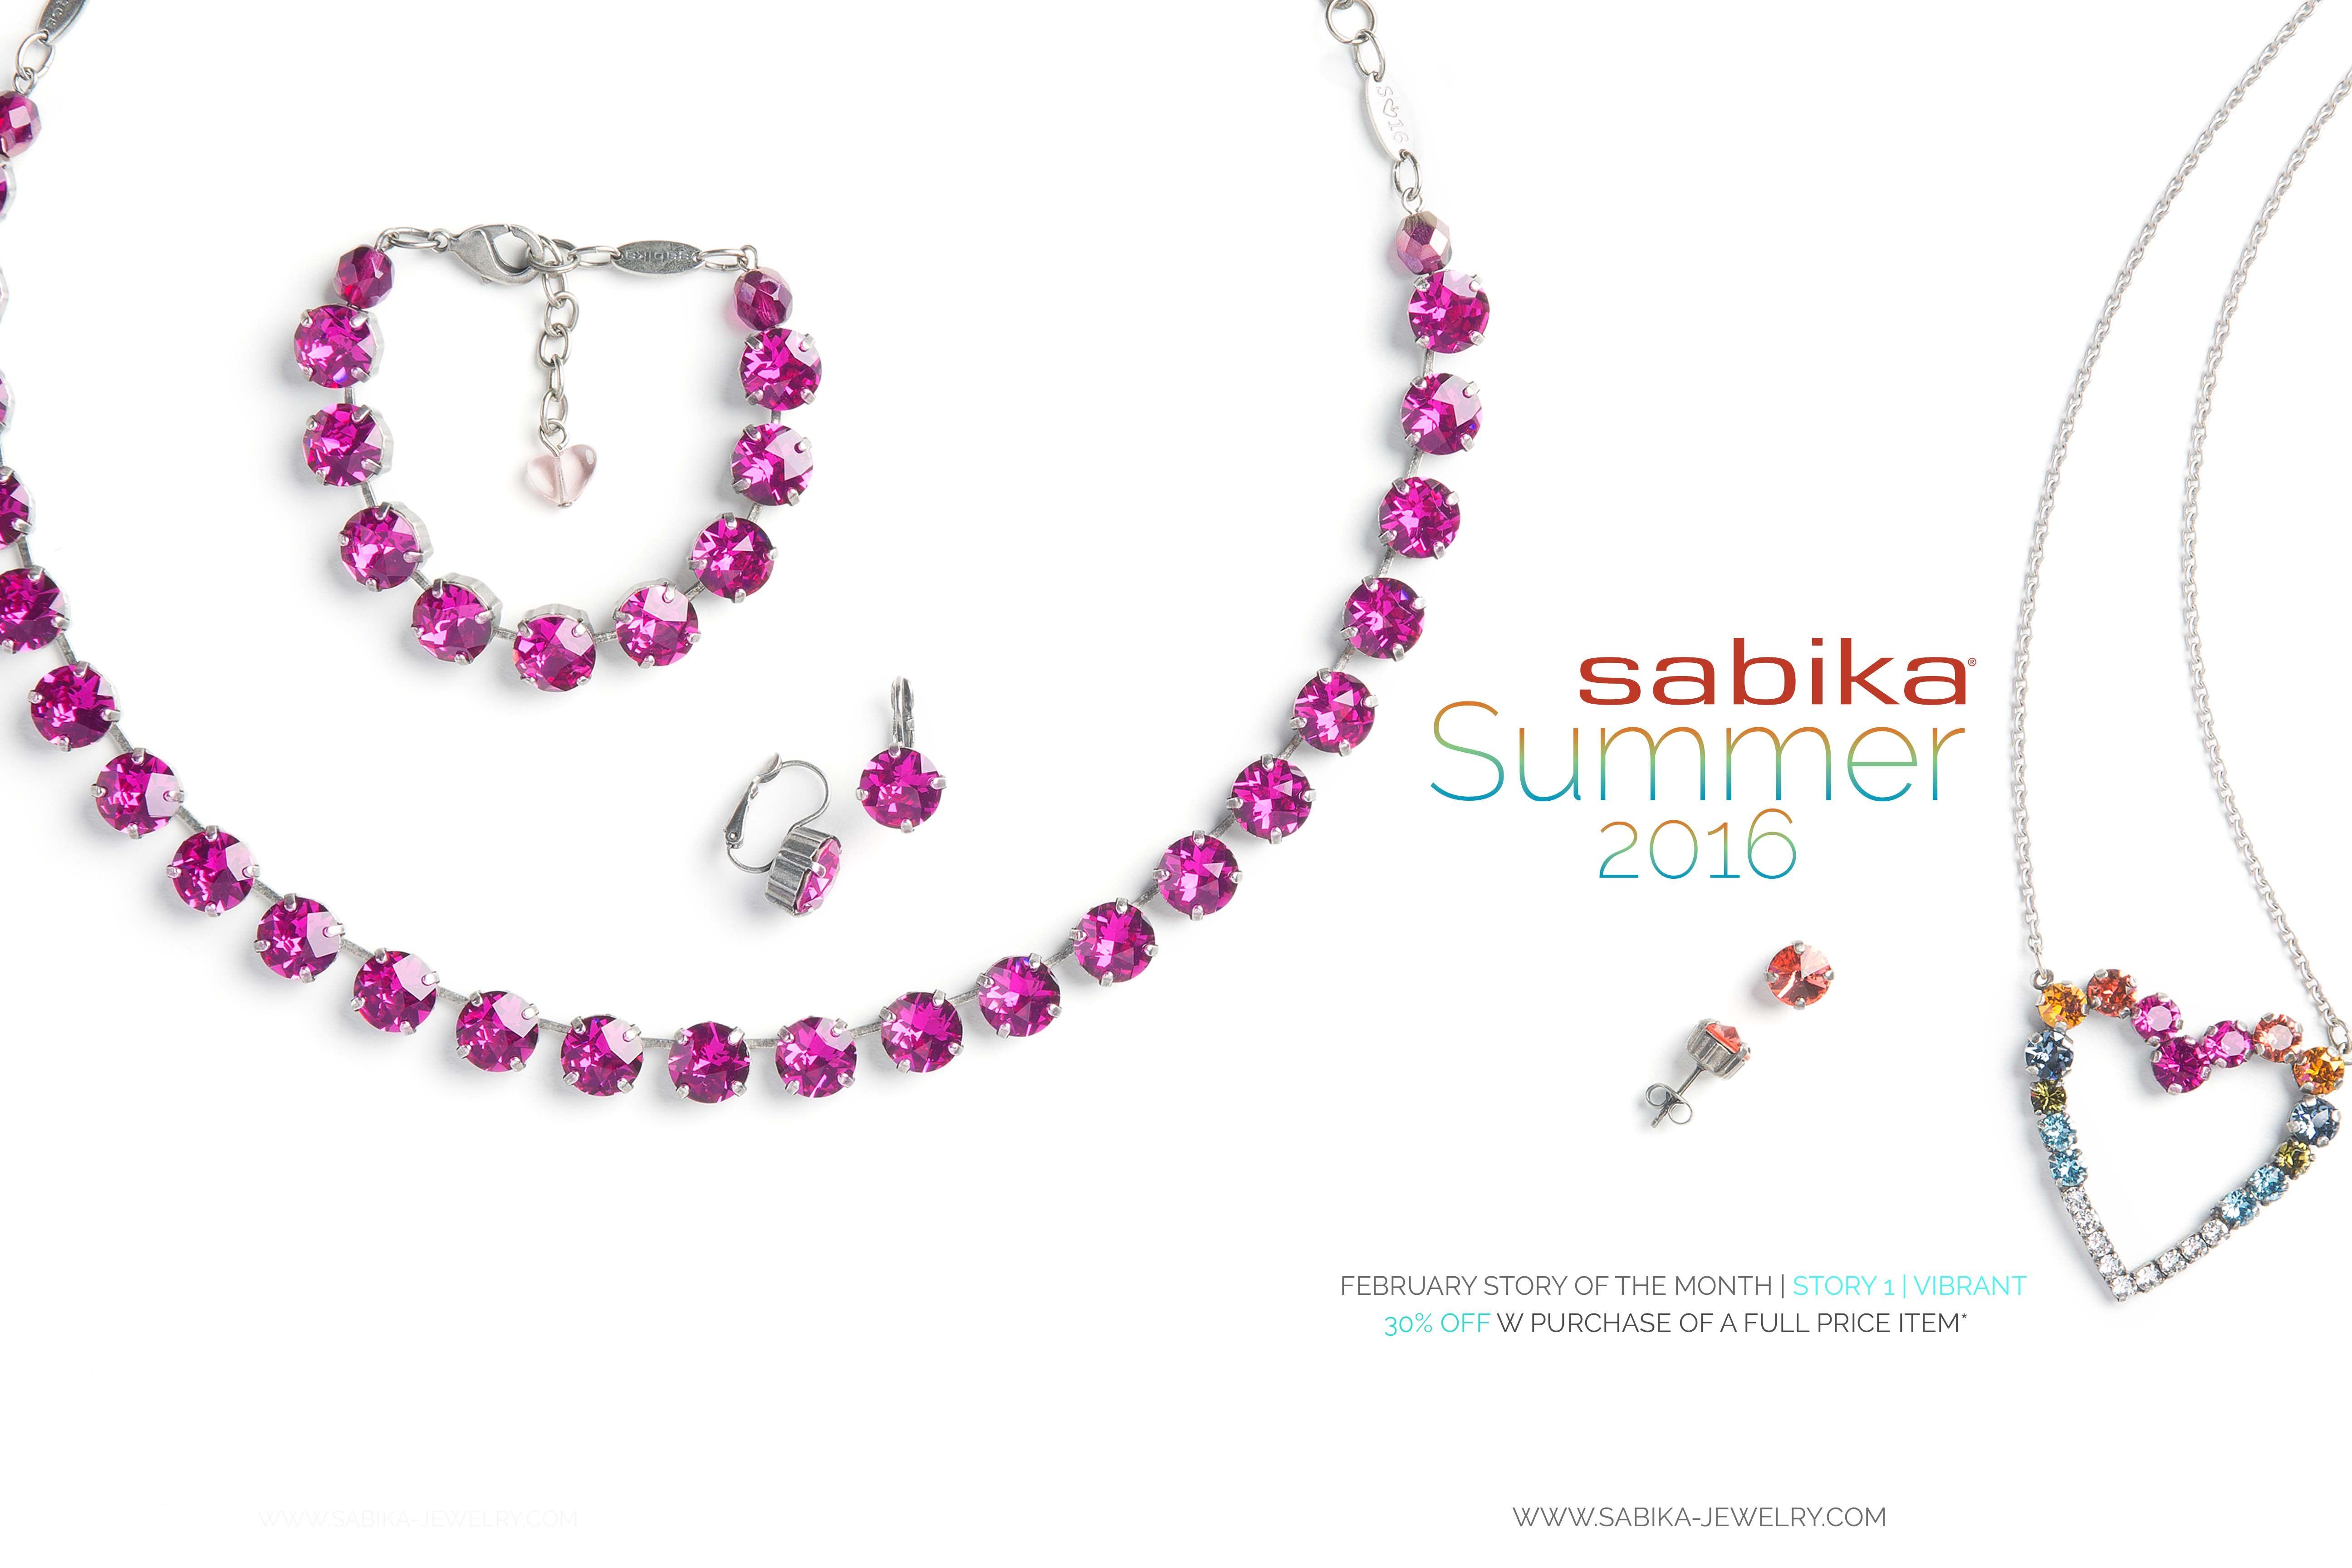 Sabika look necklace - Sabika Making Sabika Look Alike Necklaces Sabika Addict Pinterest Jewlery Winter Collection And Red Carpet